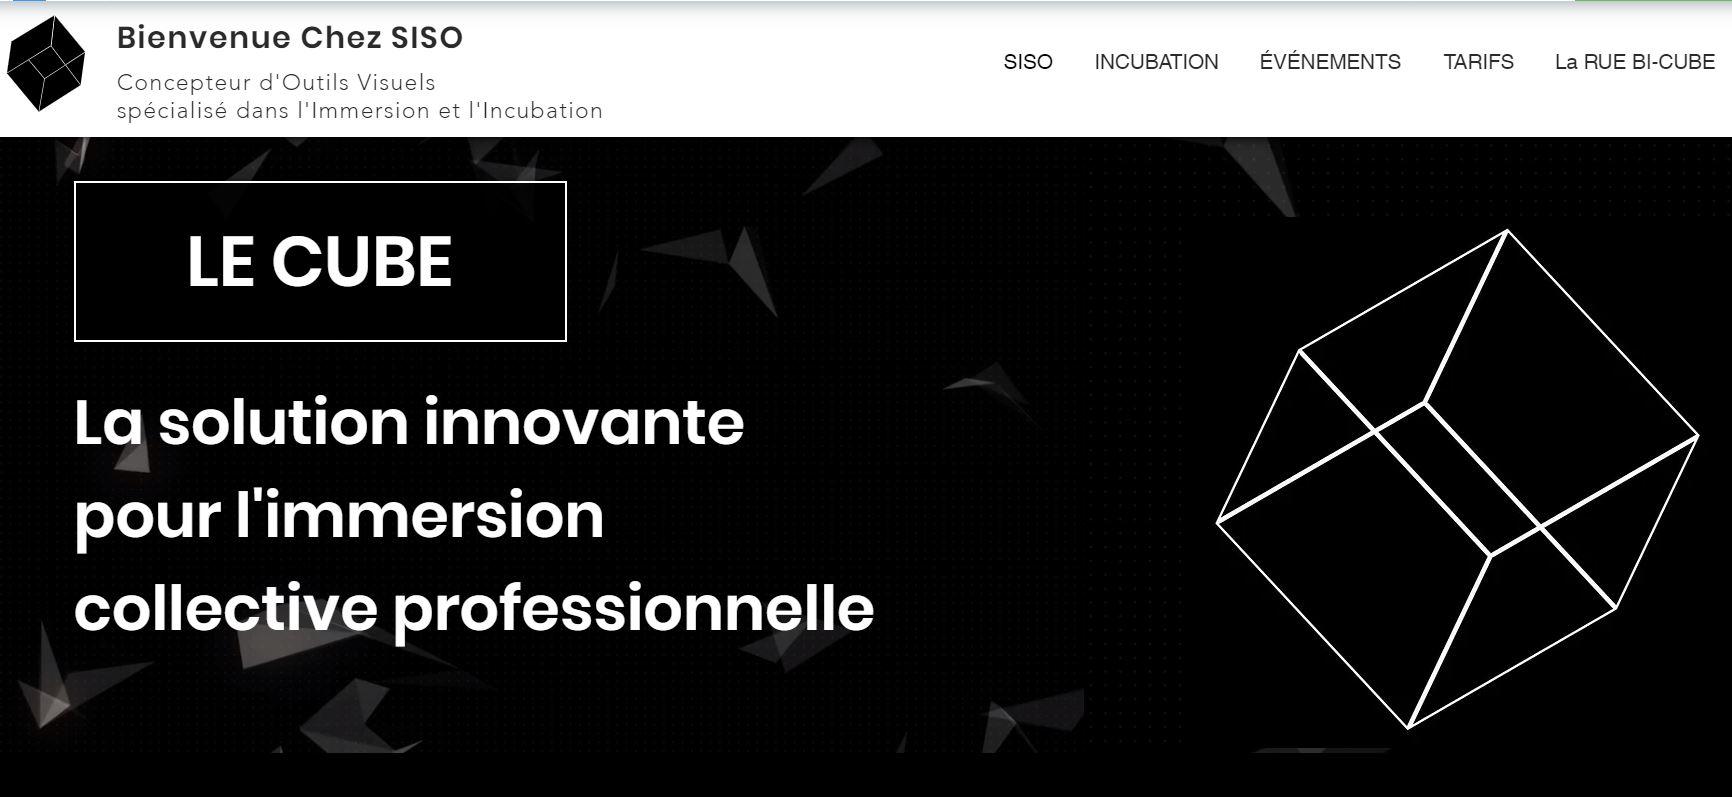 www.incubation-immersion-entreprises.com